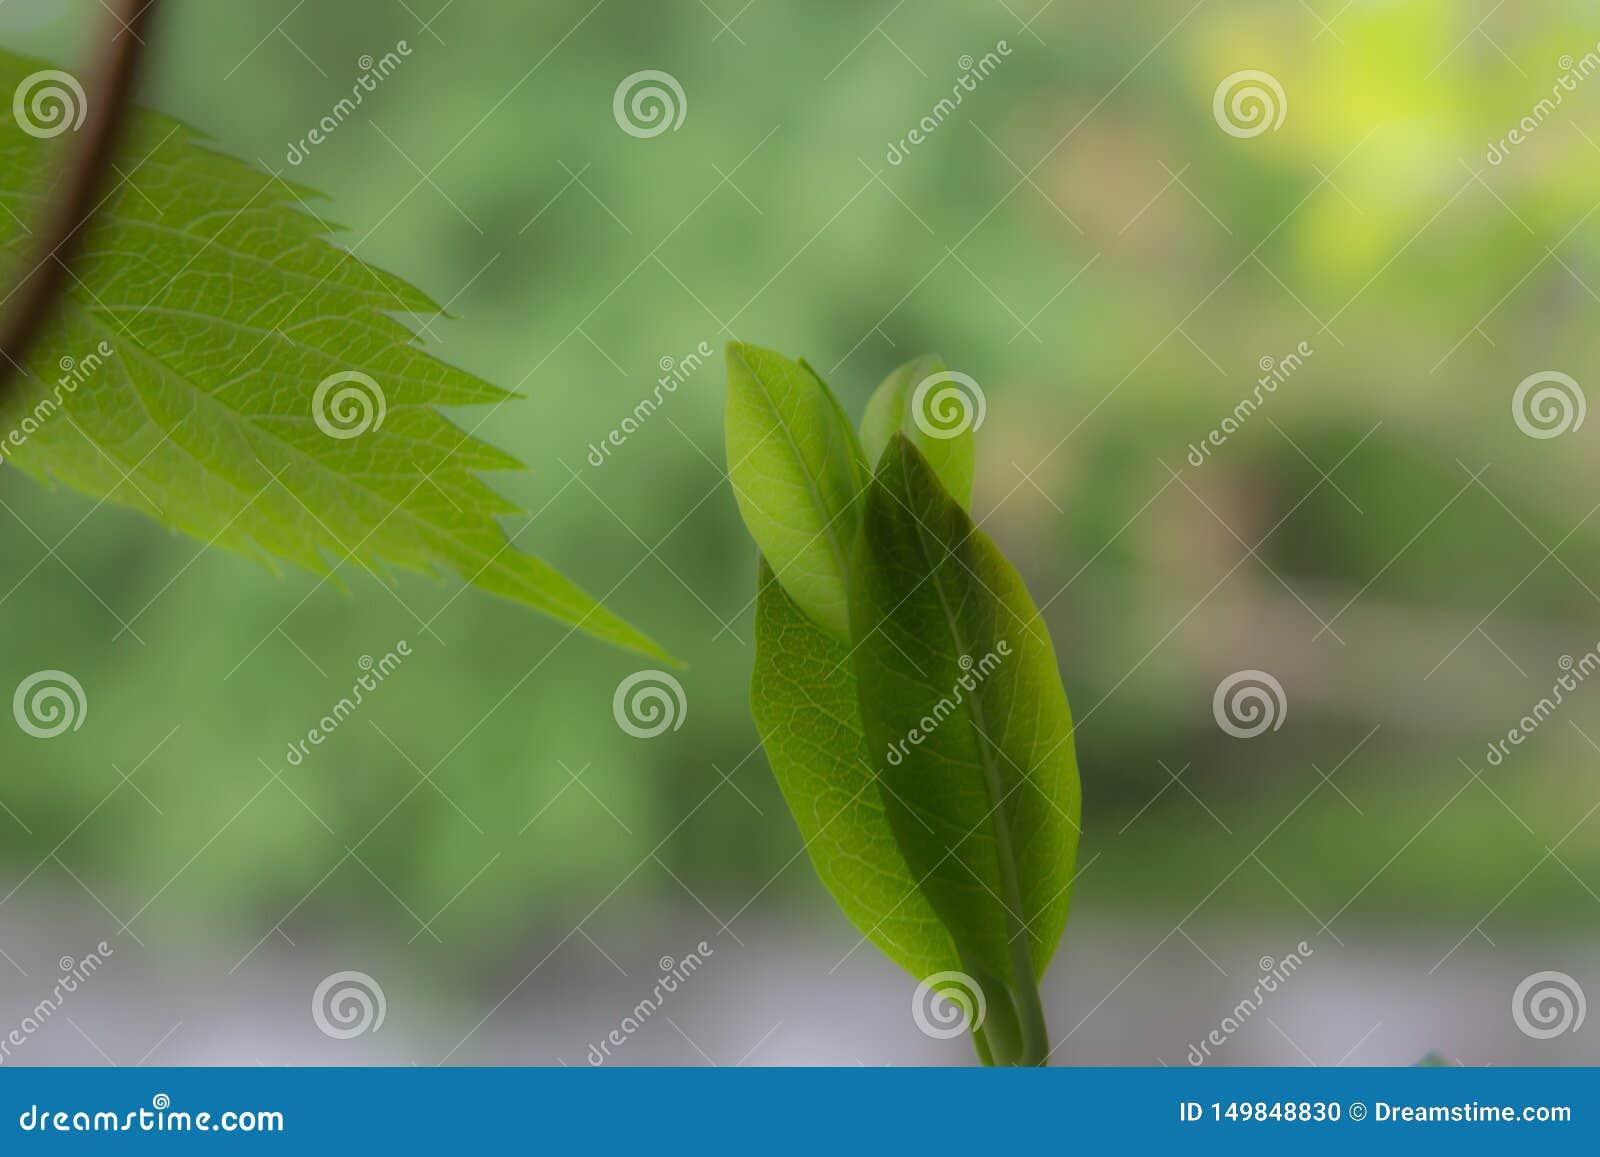 Hoja, verdor, verano, primavera, verde, hermosa, naturaleza, planta, joven, color, naturaleza, esperanza